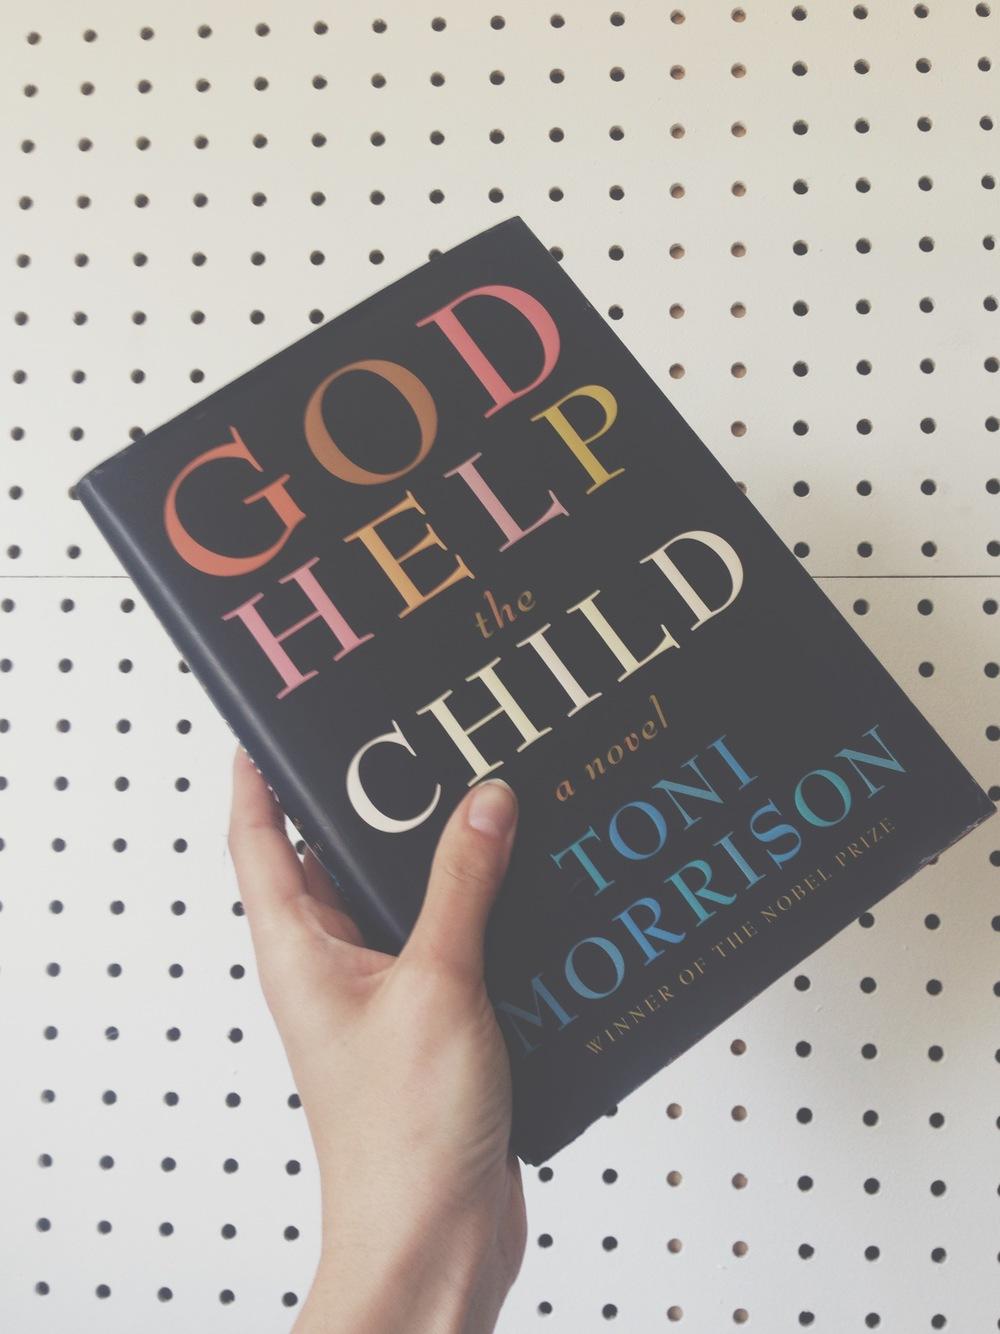 Feels-Design-Studio_God-Help-The-Child-Book-Design-Review-1.jpg